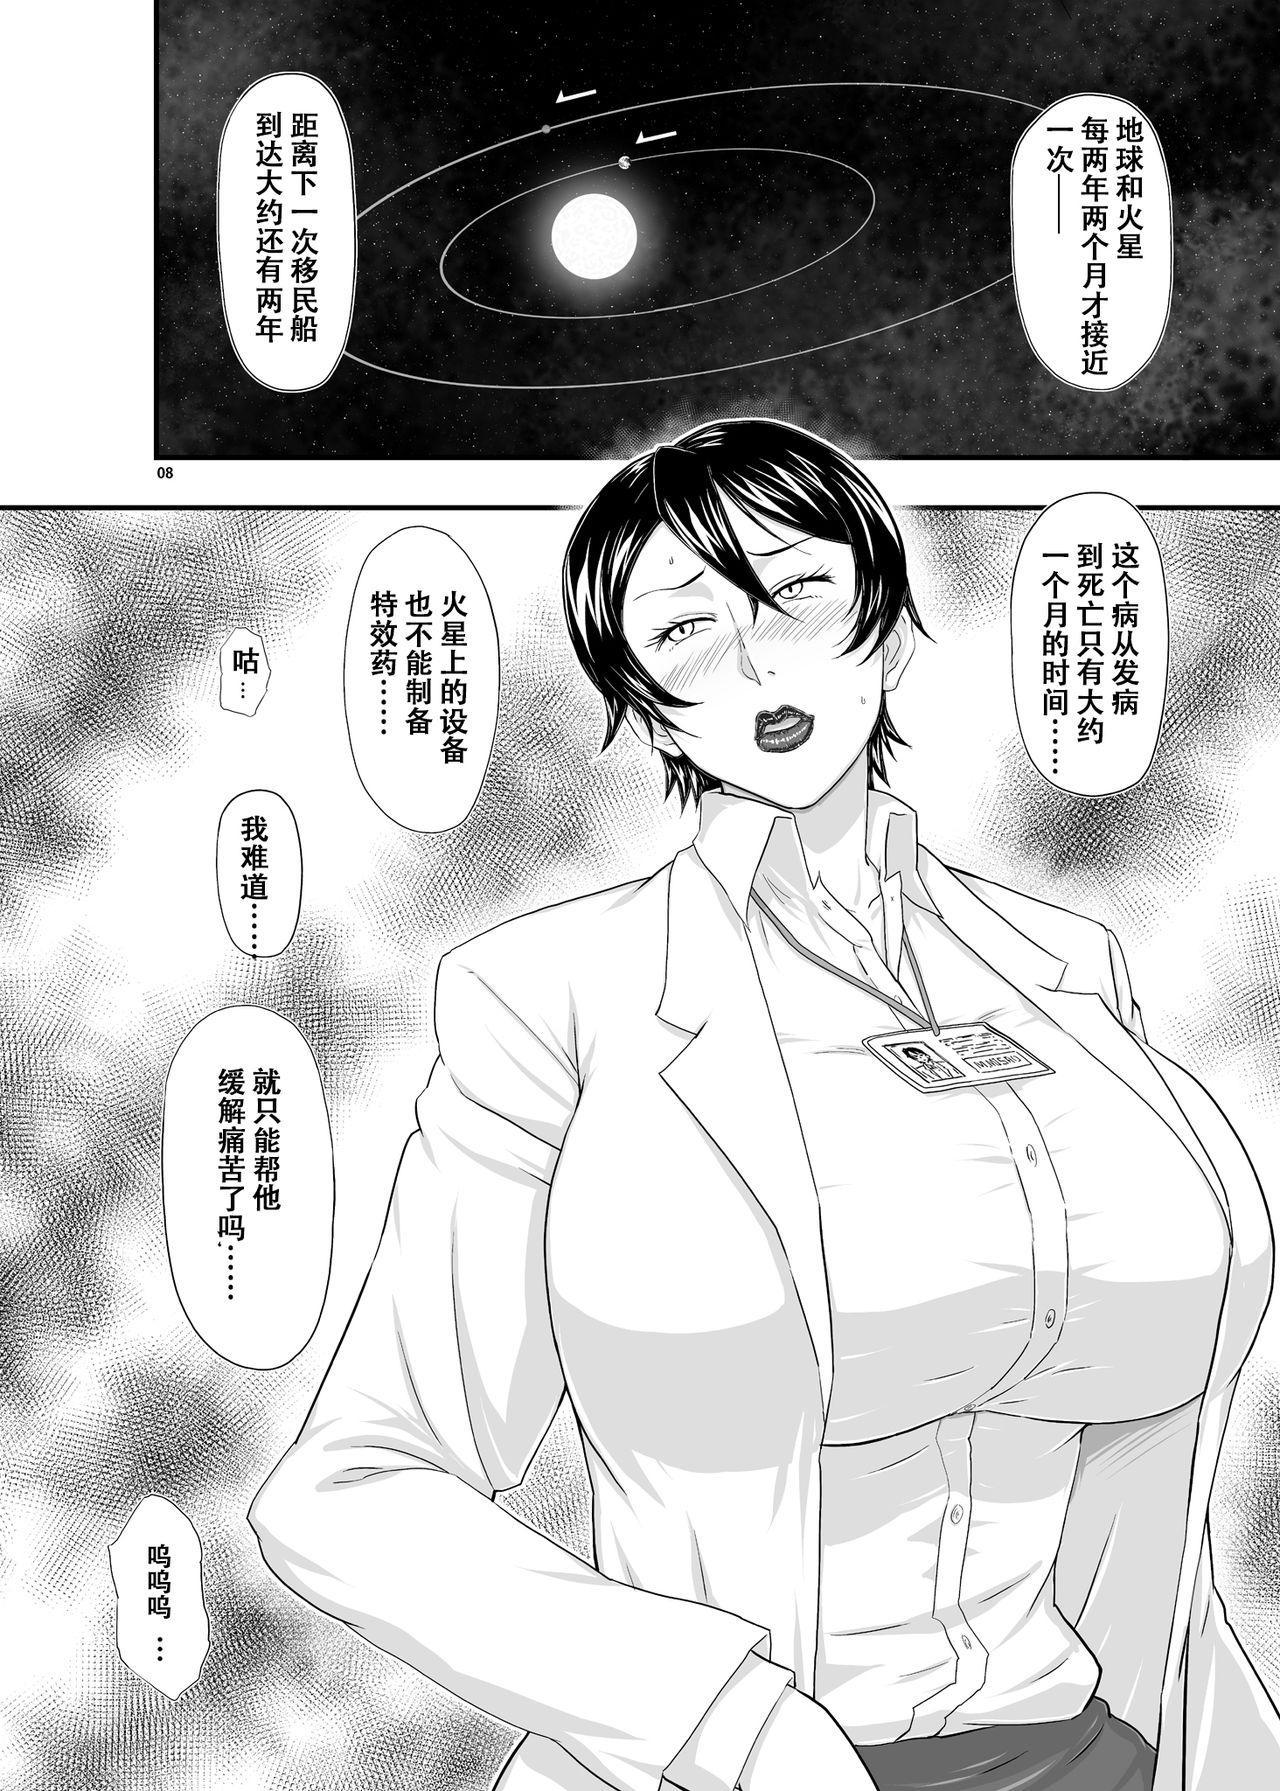 MARS EXPLORER III Misao 7